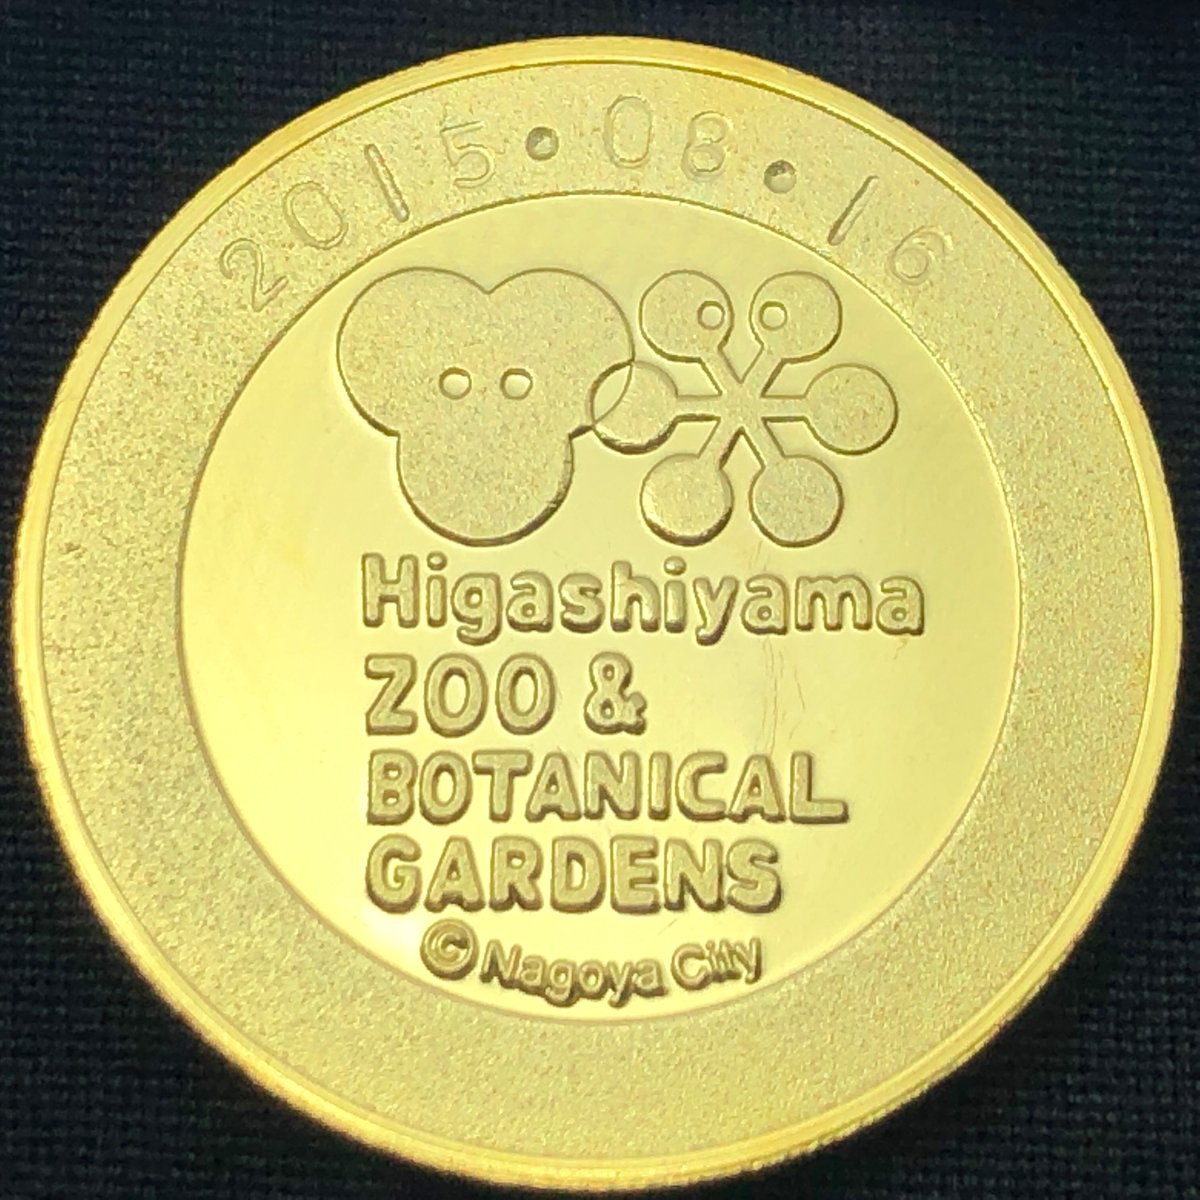 test ツイッターメディア - 東山動植物園の記念メダル(キリン)。 https://t.co/QzDKyA7NhK